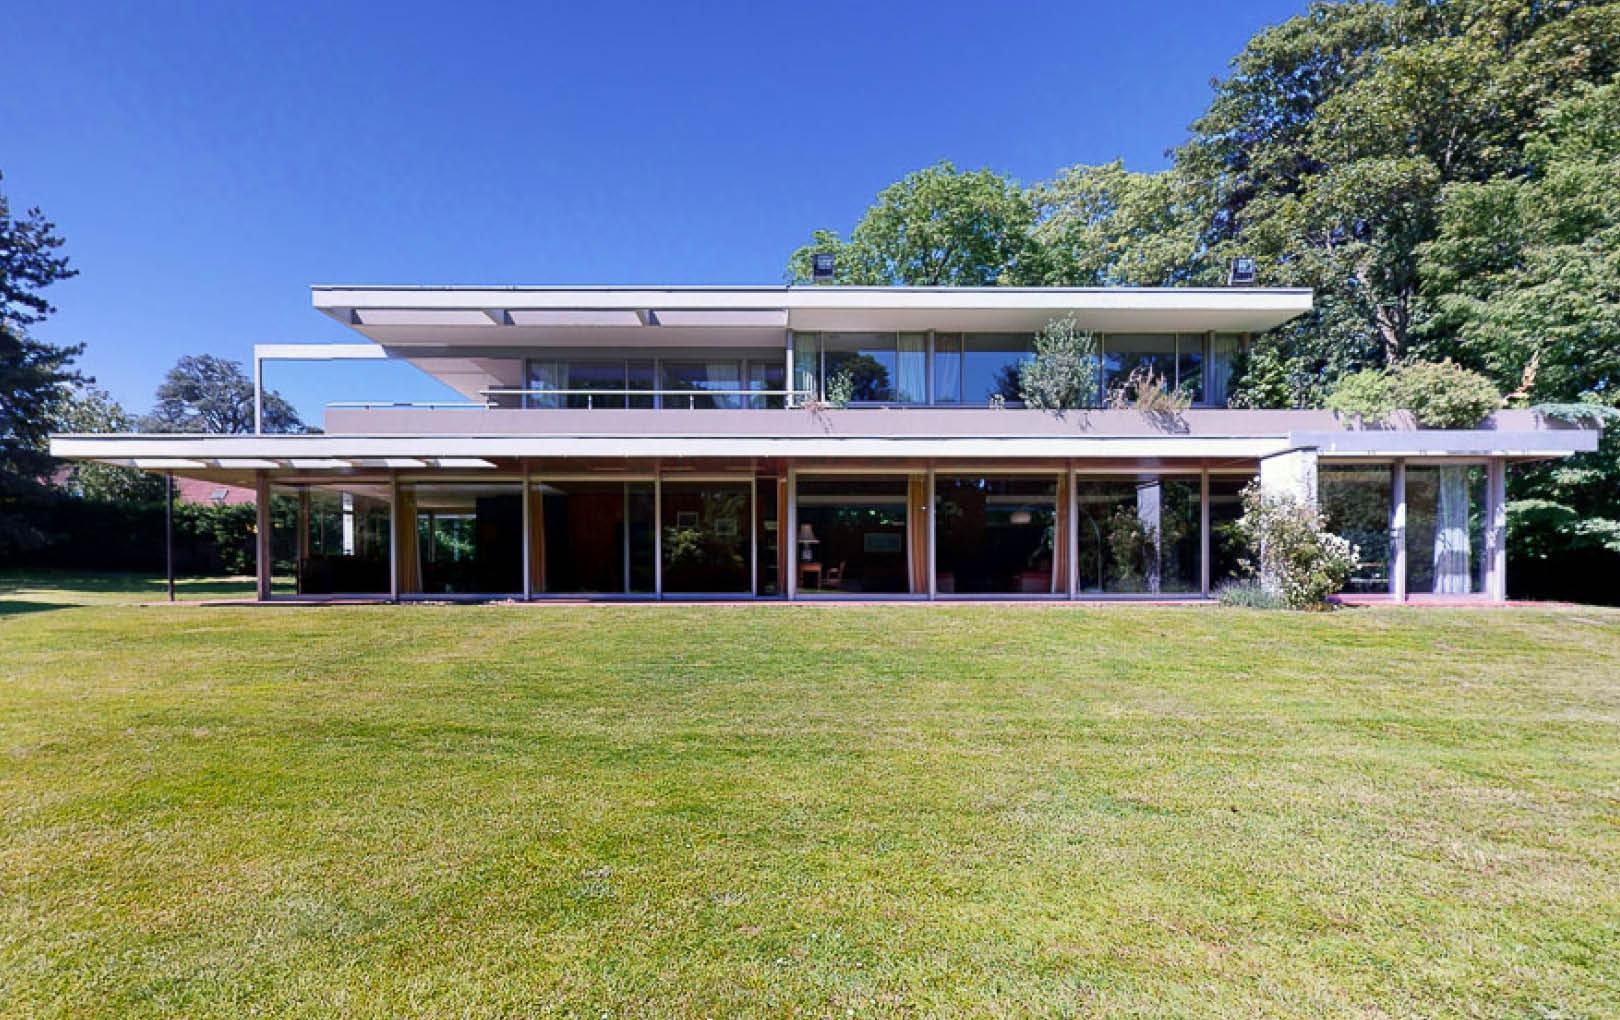 Villa Delcourt - Richard Neutra, Architect